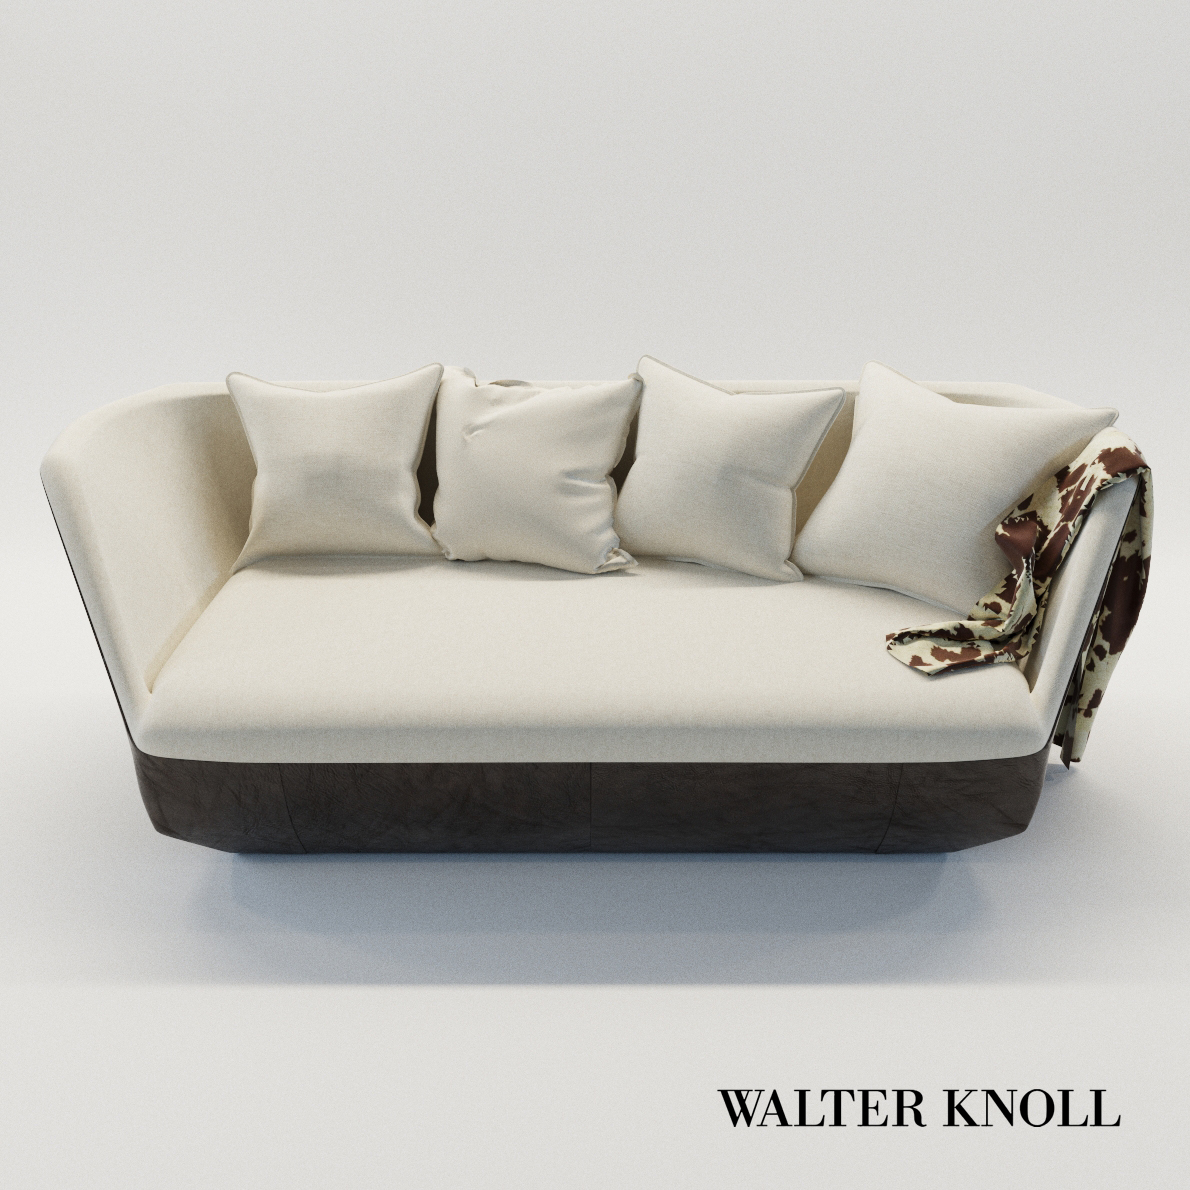 3d model Sofa Isanka – Design by EOOS (Walter Knoll)